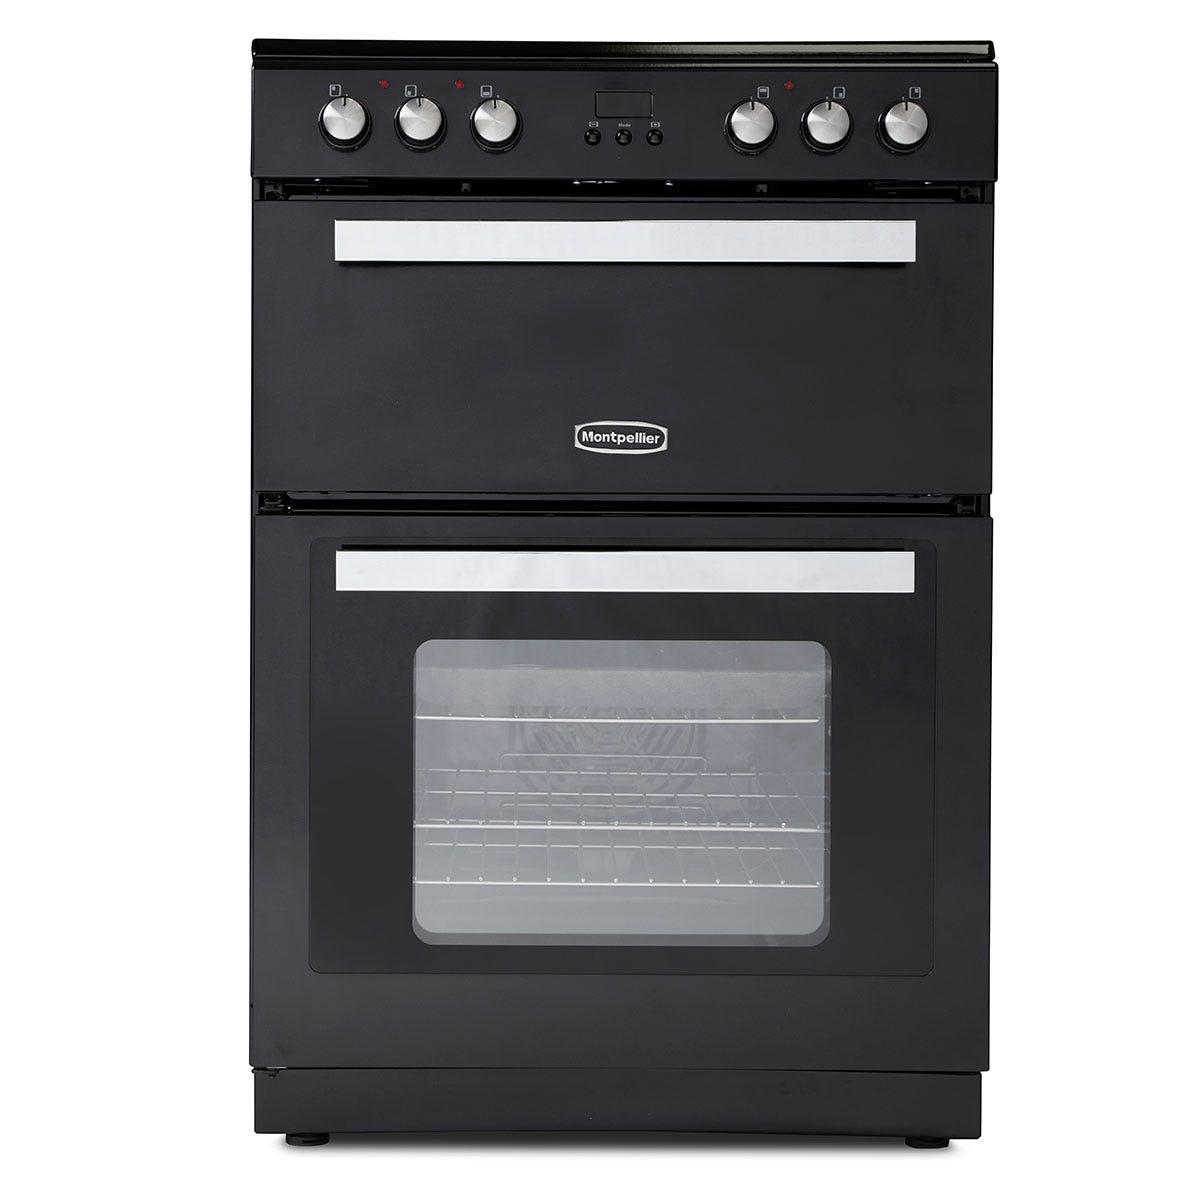 Montpellier RMC61CK 60cm Ceramic Mini Range Cooker with Double Oven - Black